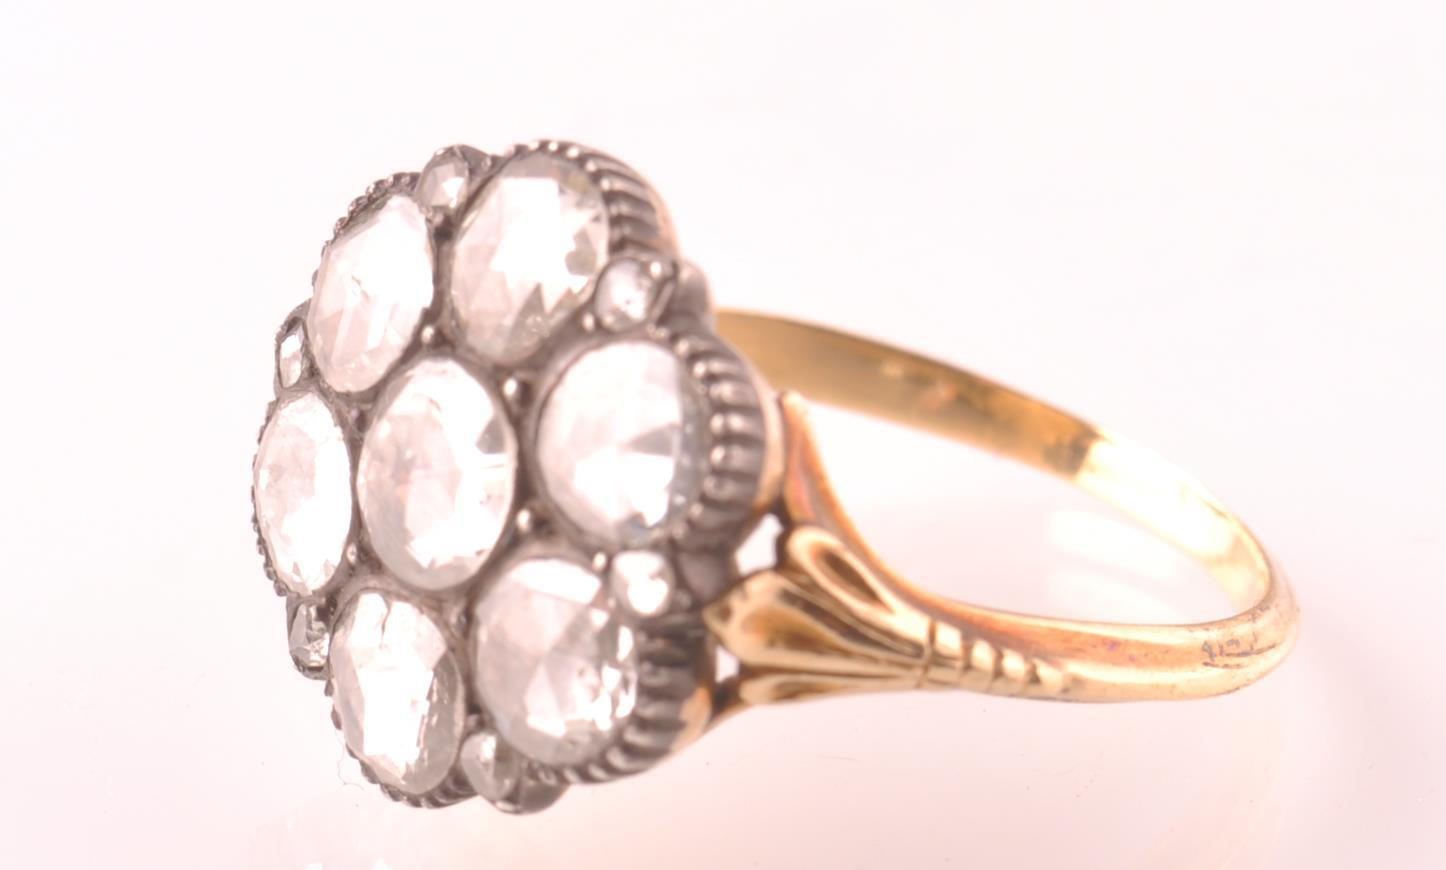 Lot 24 - 19TH CENTURY ROSE CUT DIAMOND CLUSTER RING